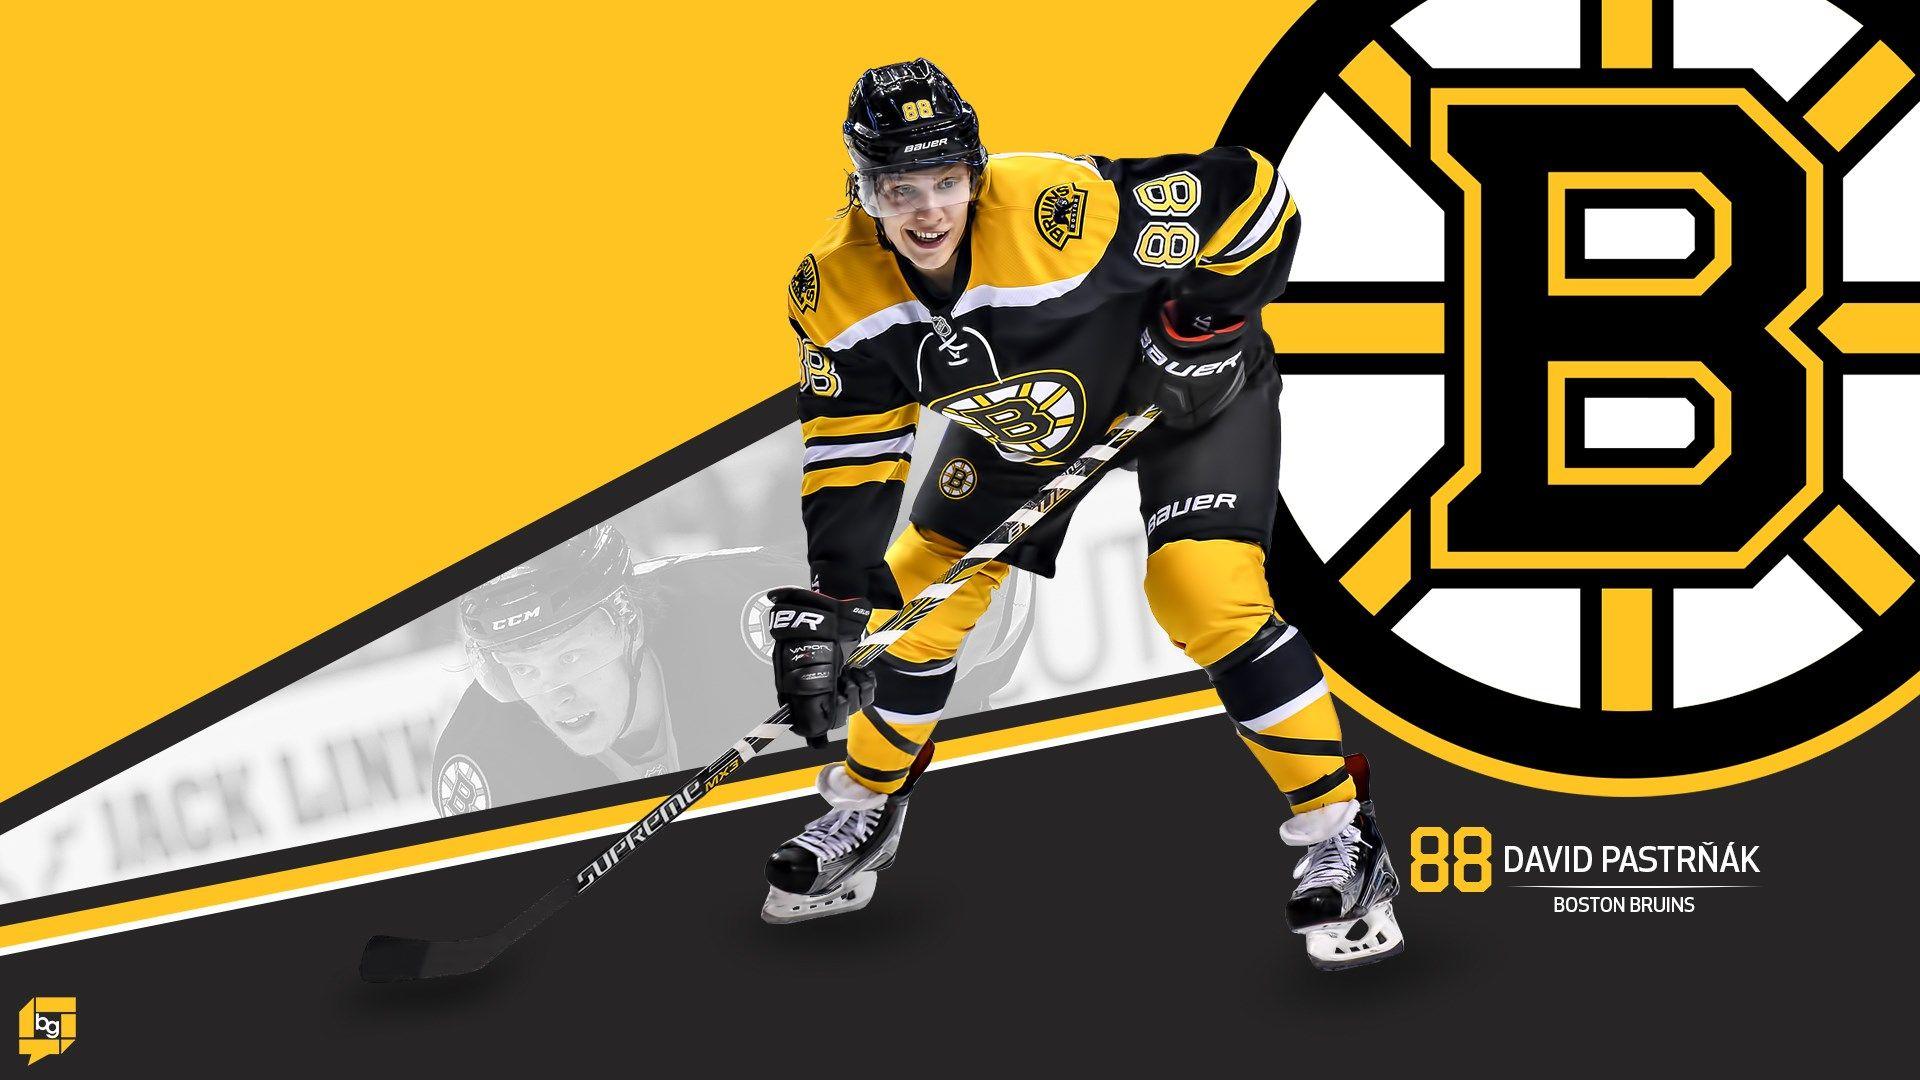 Tuukka Rask Bruins Widescreen Wallpaper